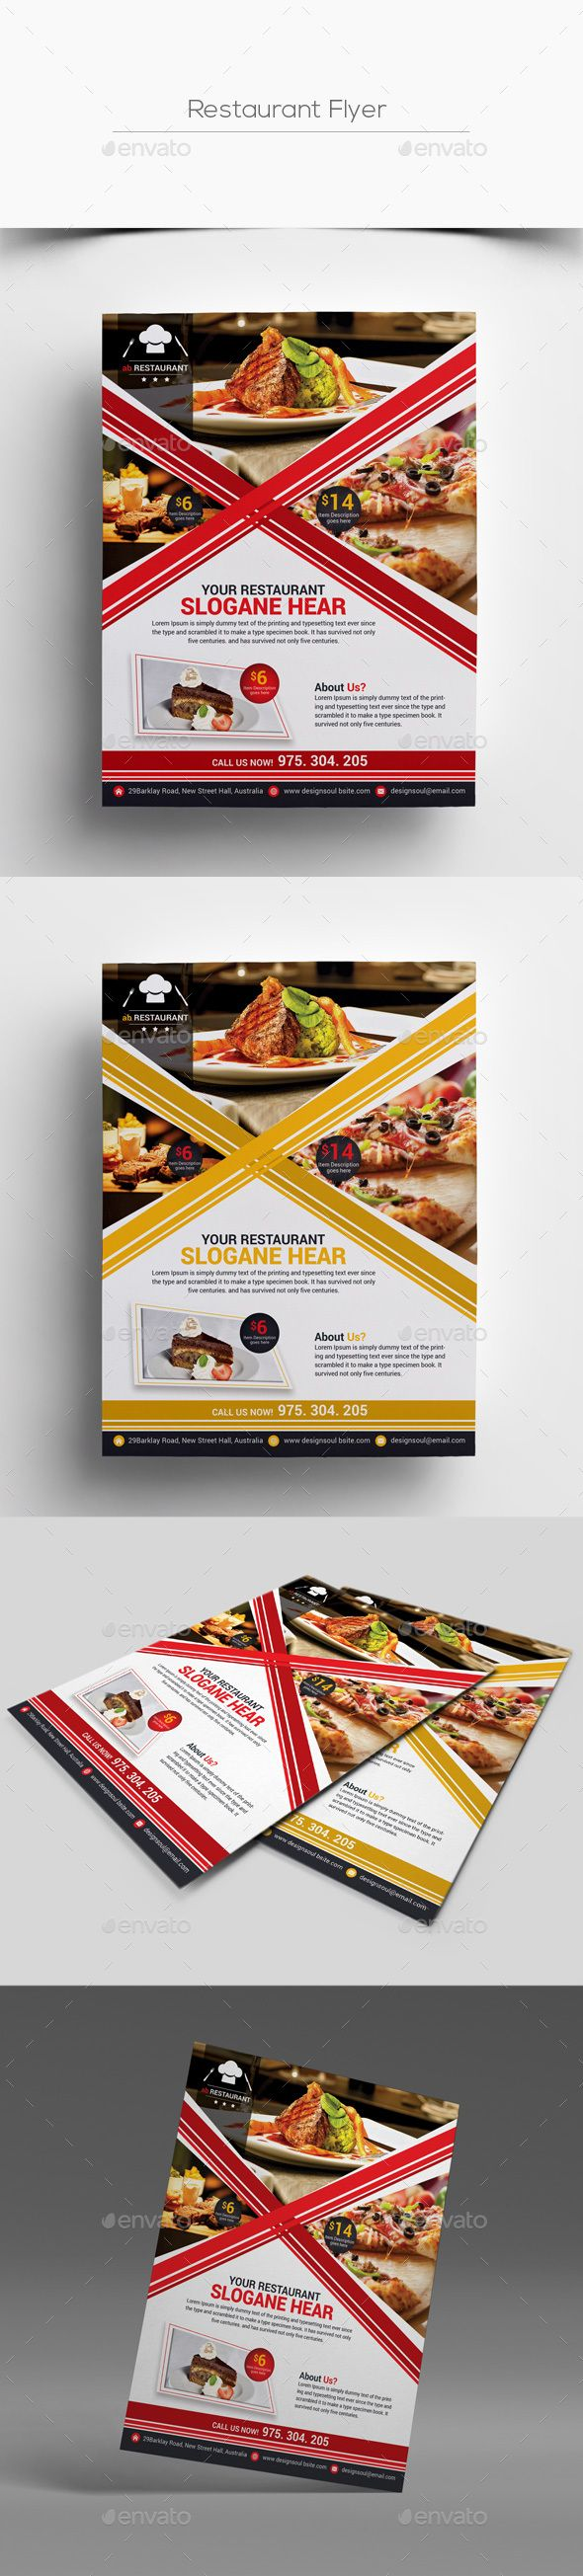 Restaurant Flyer — Photoshop PSD #menu ideas #coffee flyer • Available here → https://graphicriver.net/item/restaurant-flyer/17664358?ref=pxcr